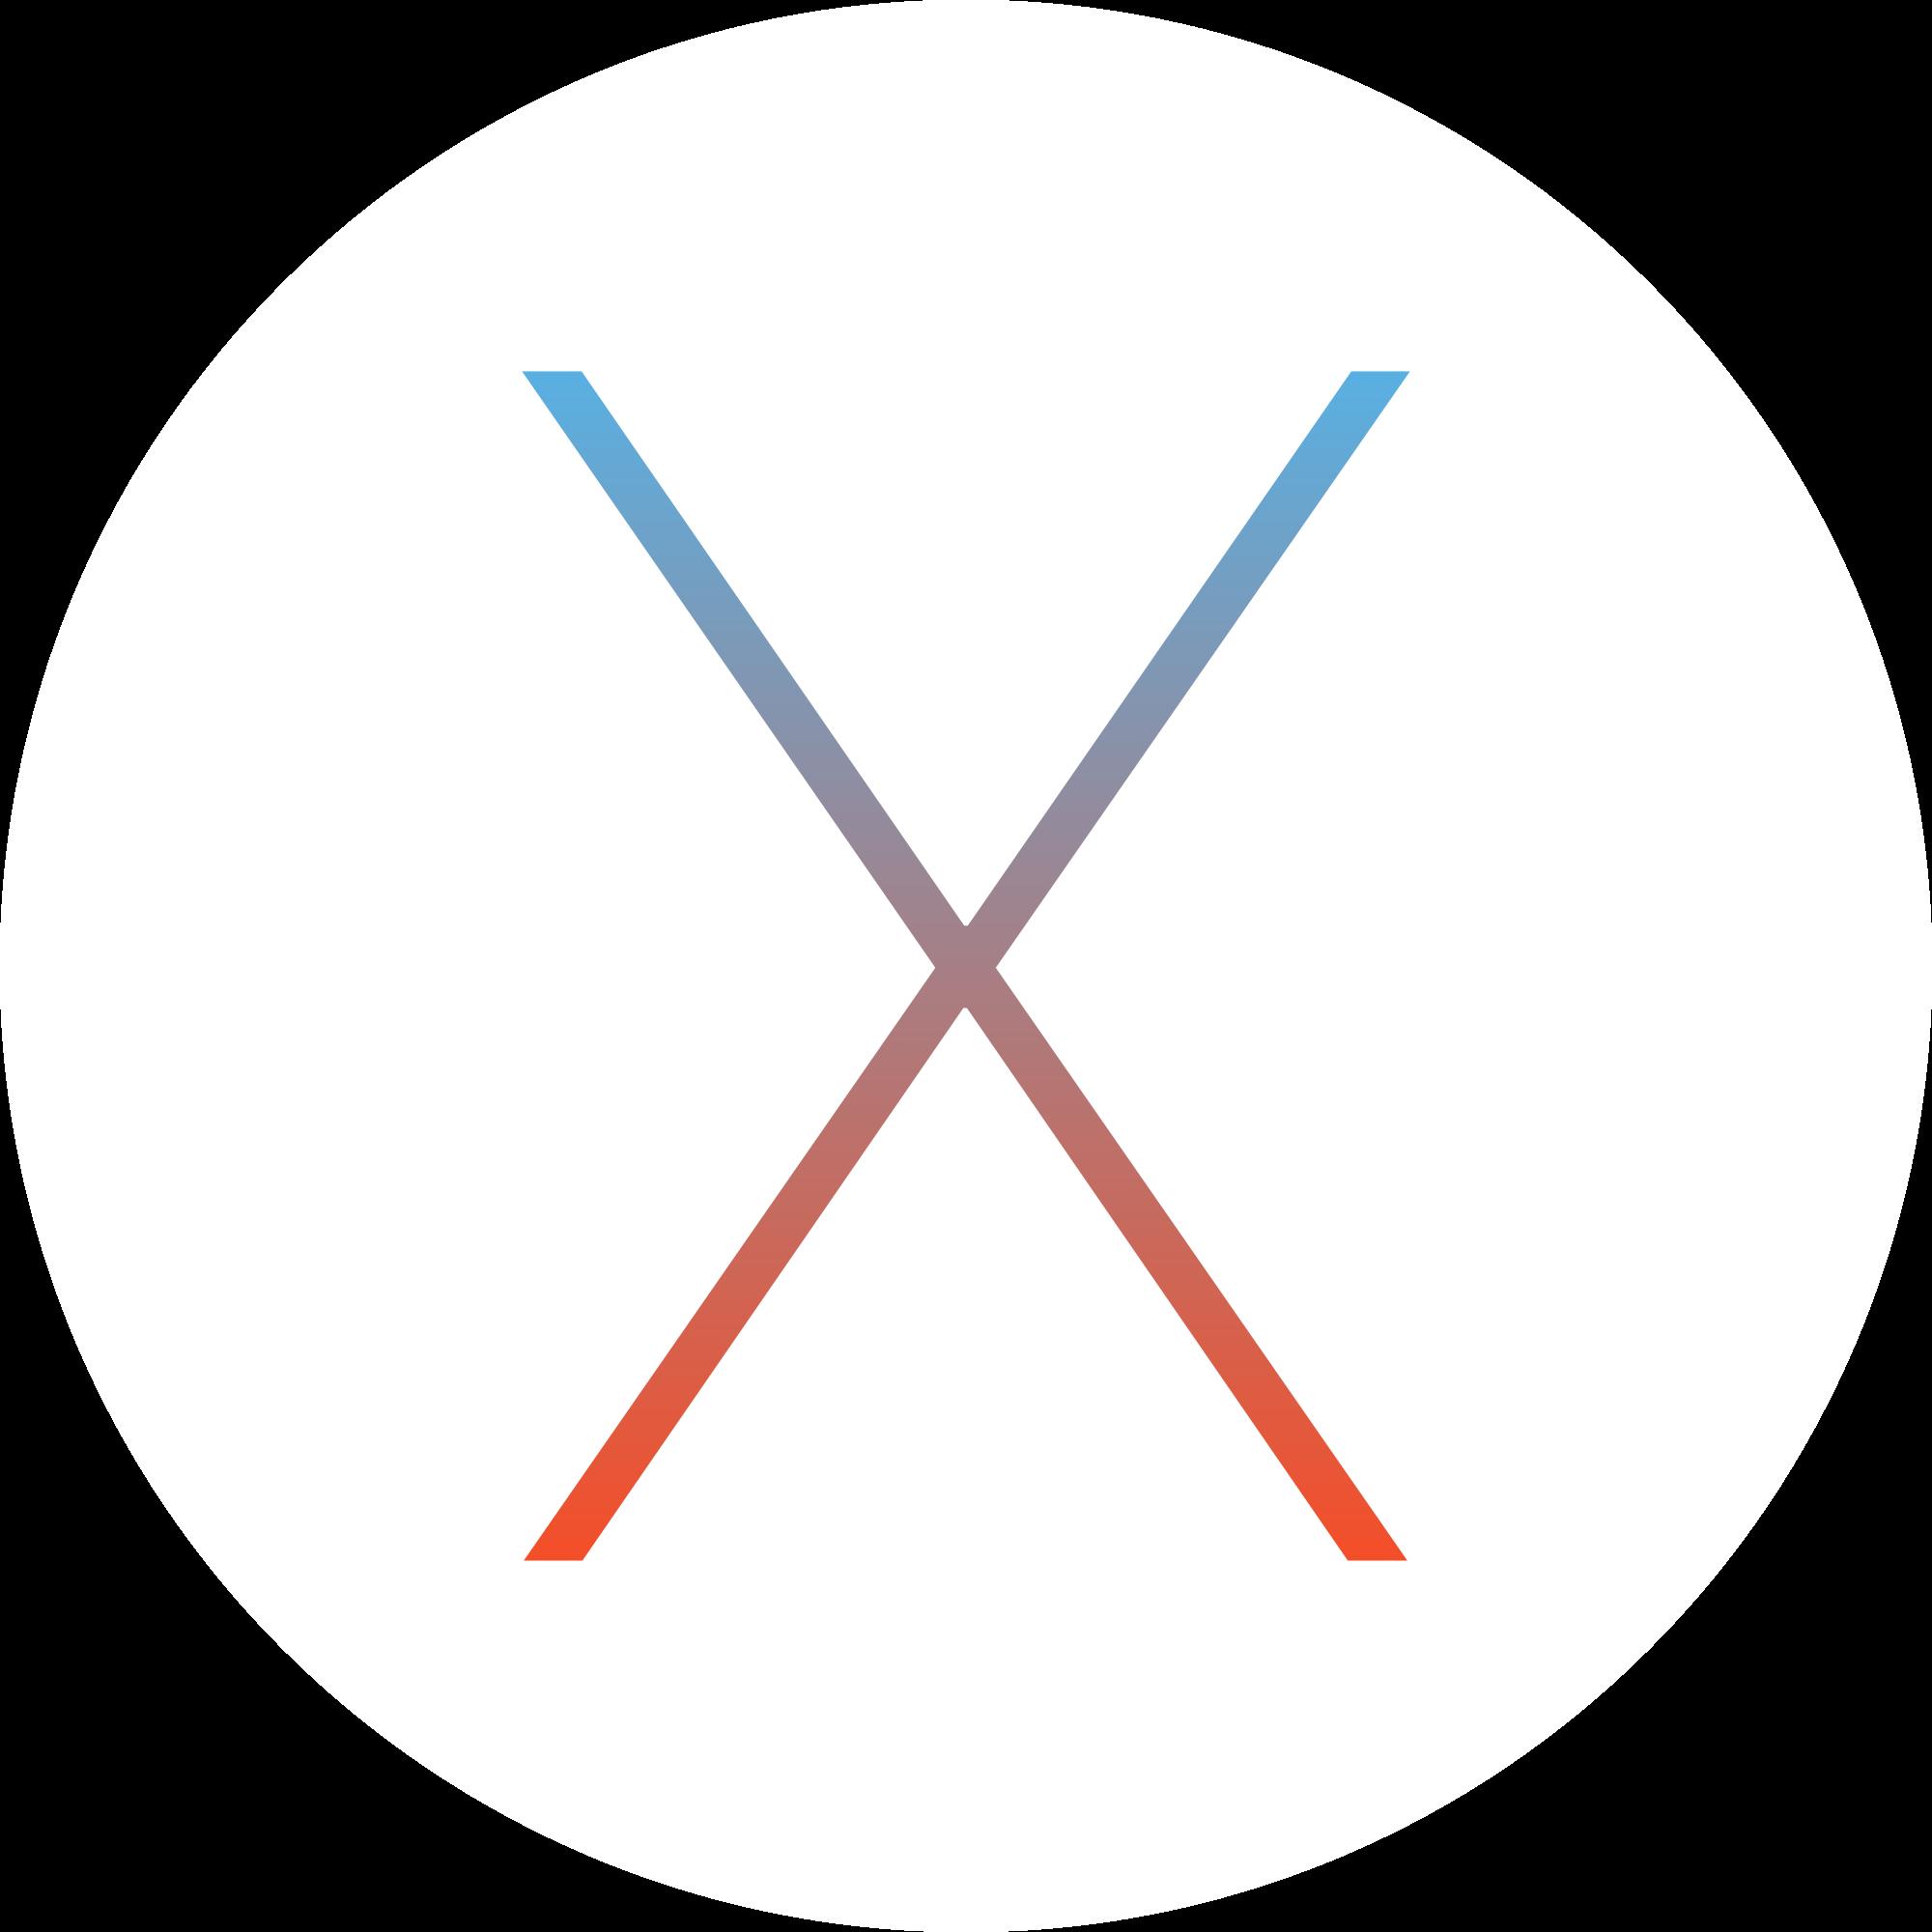 Mac Os X PNG - 3929